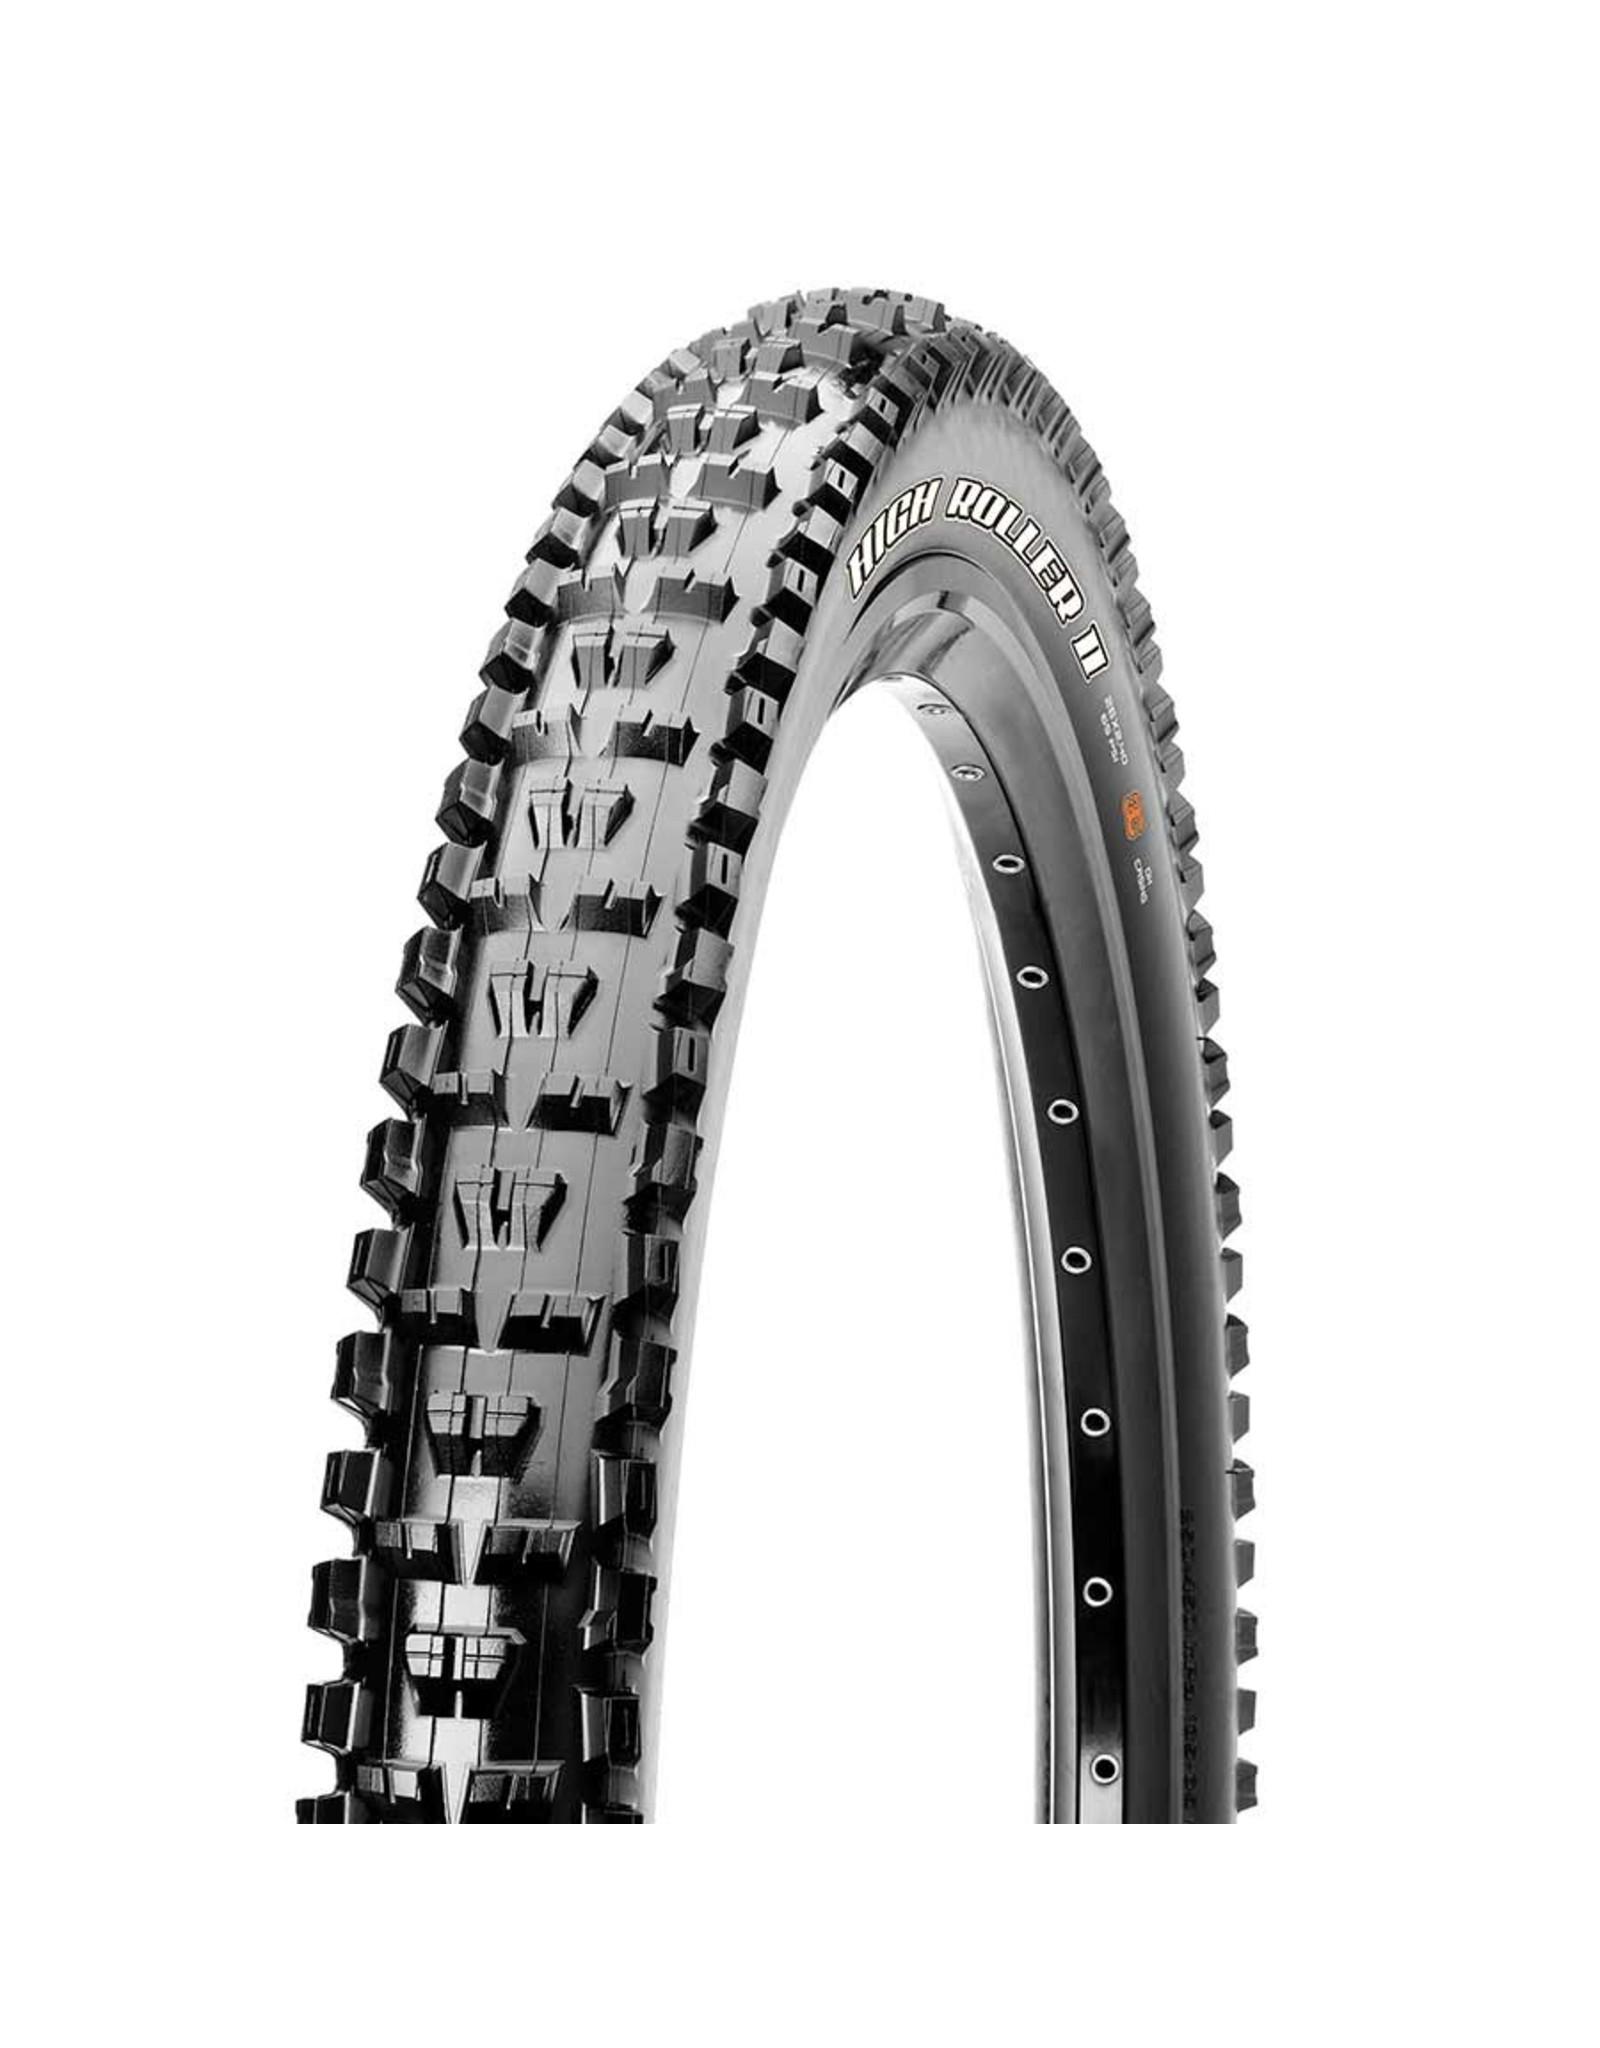 Maxxis Maxxis, High Roller II, Tire, 29''x2.30, Folding, Tubeless Ready, 3C Maxx Terra, EXO, 60TPI, Black